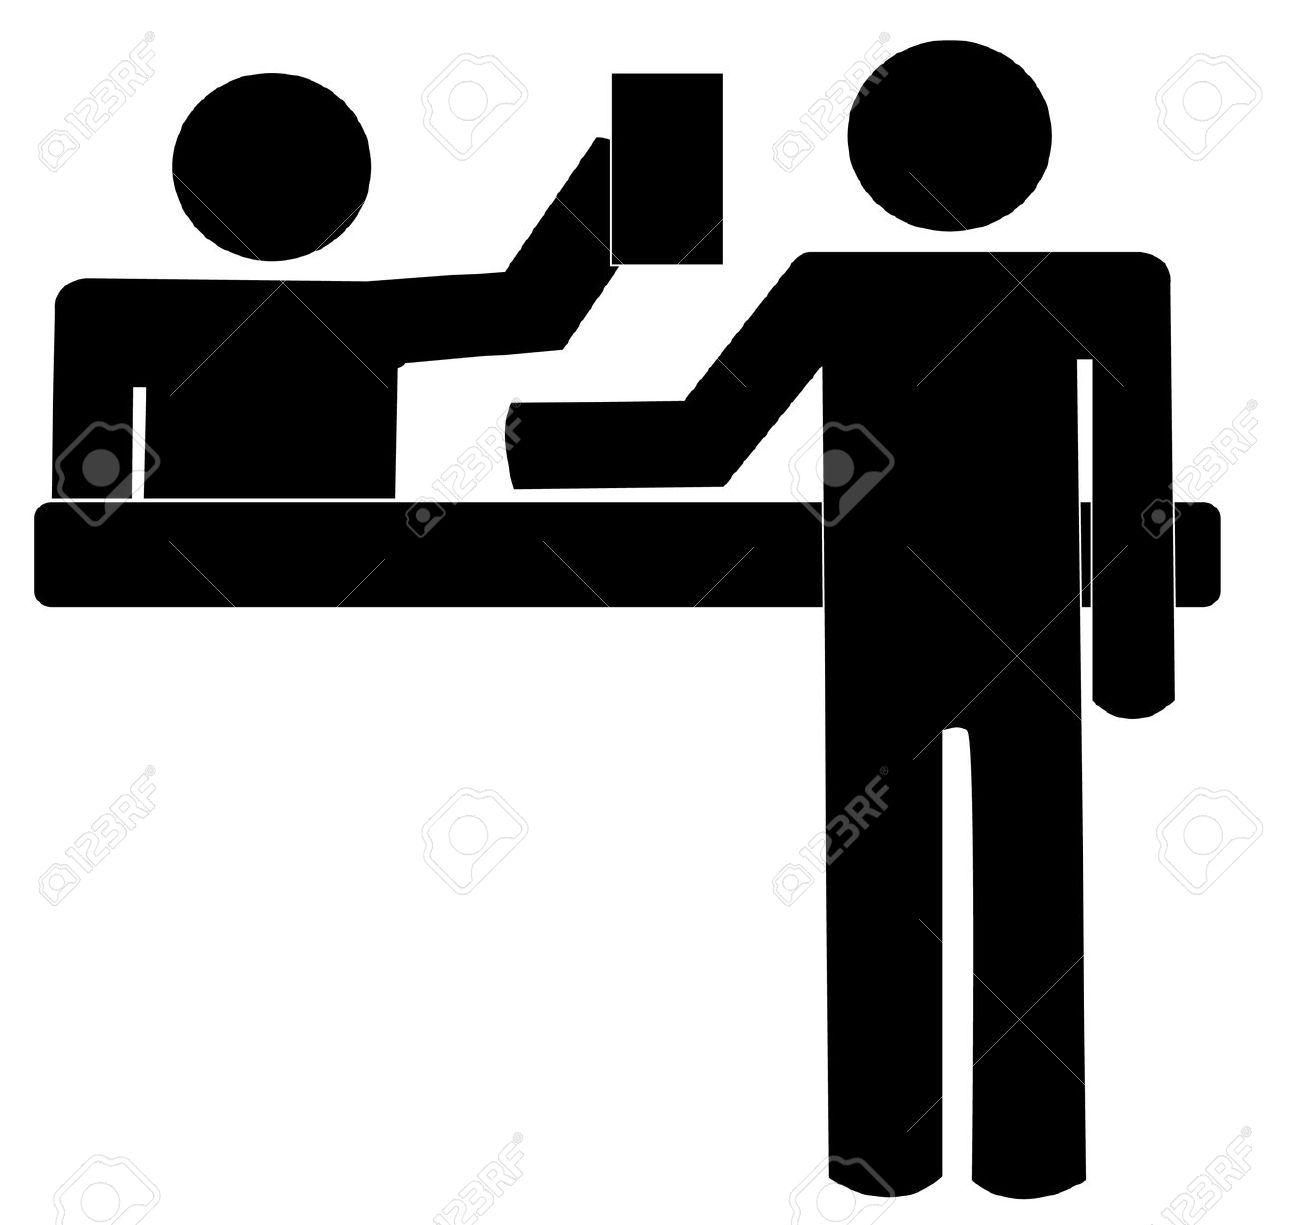 Concierge icon clipart.